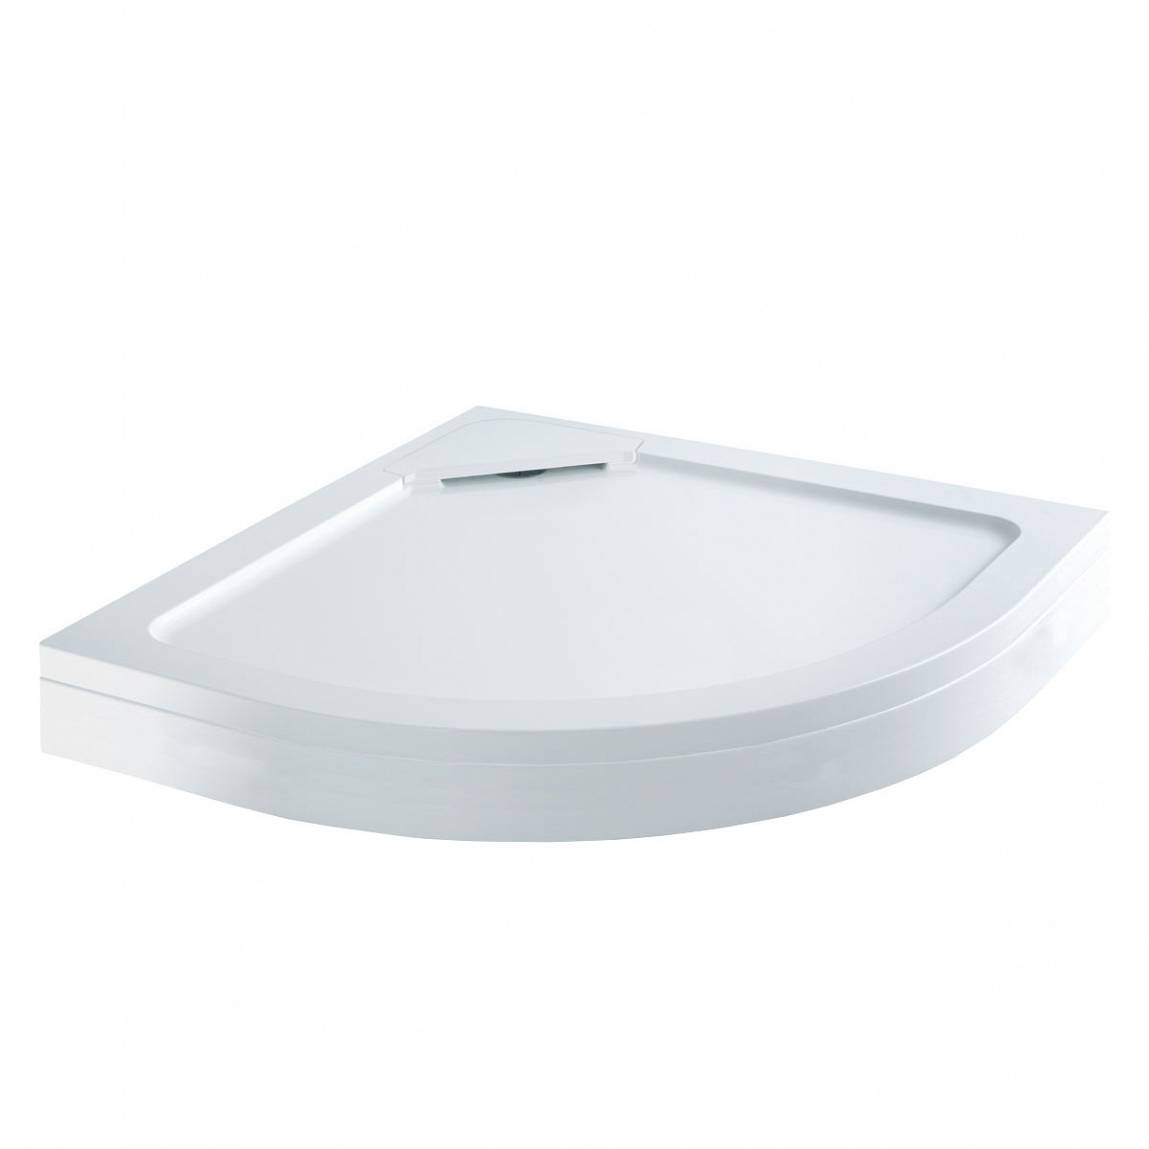 Image of Designer Quadrant Stone Shower Tray & Riser Kit 800 x 800